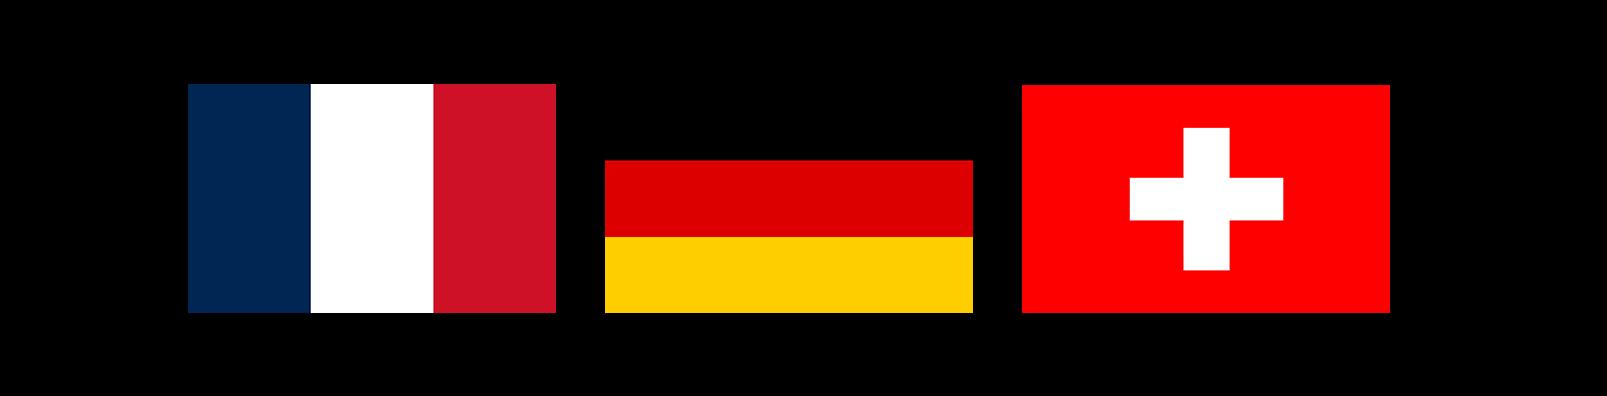 Flags france germany switzerland